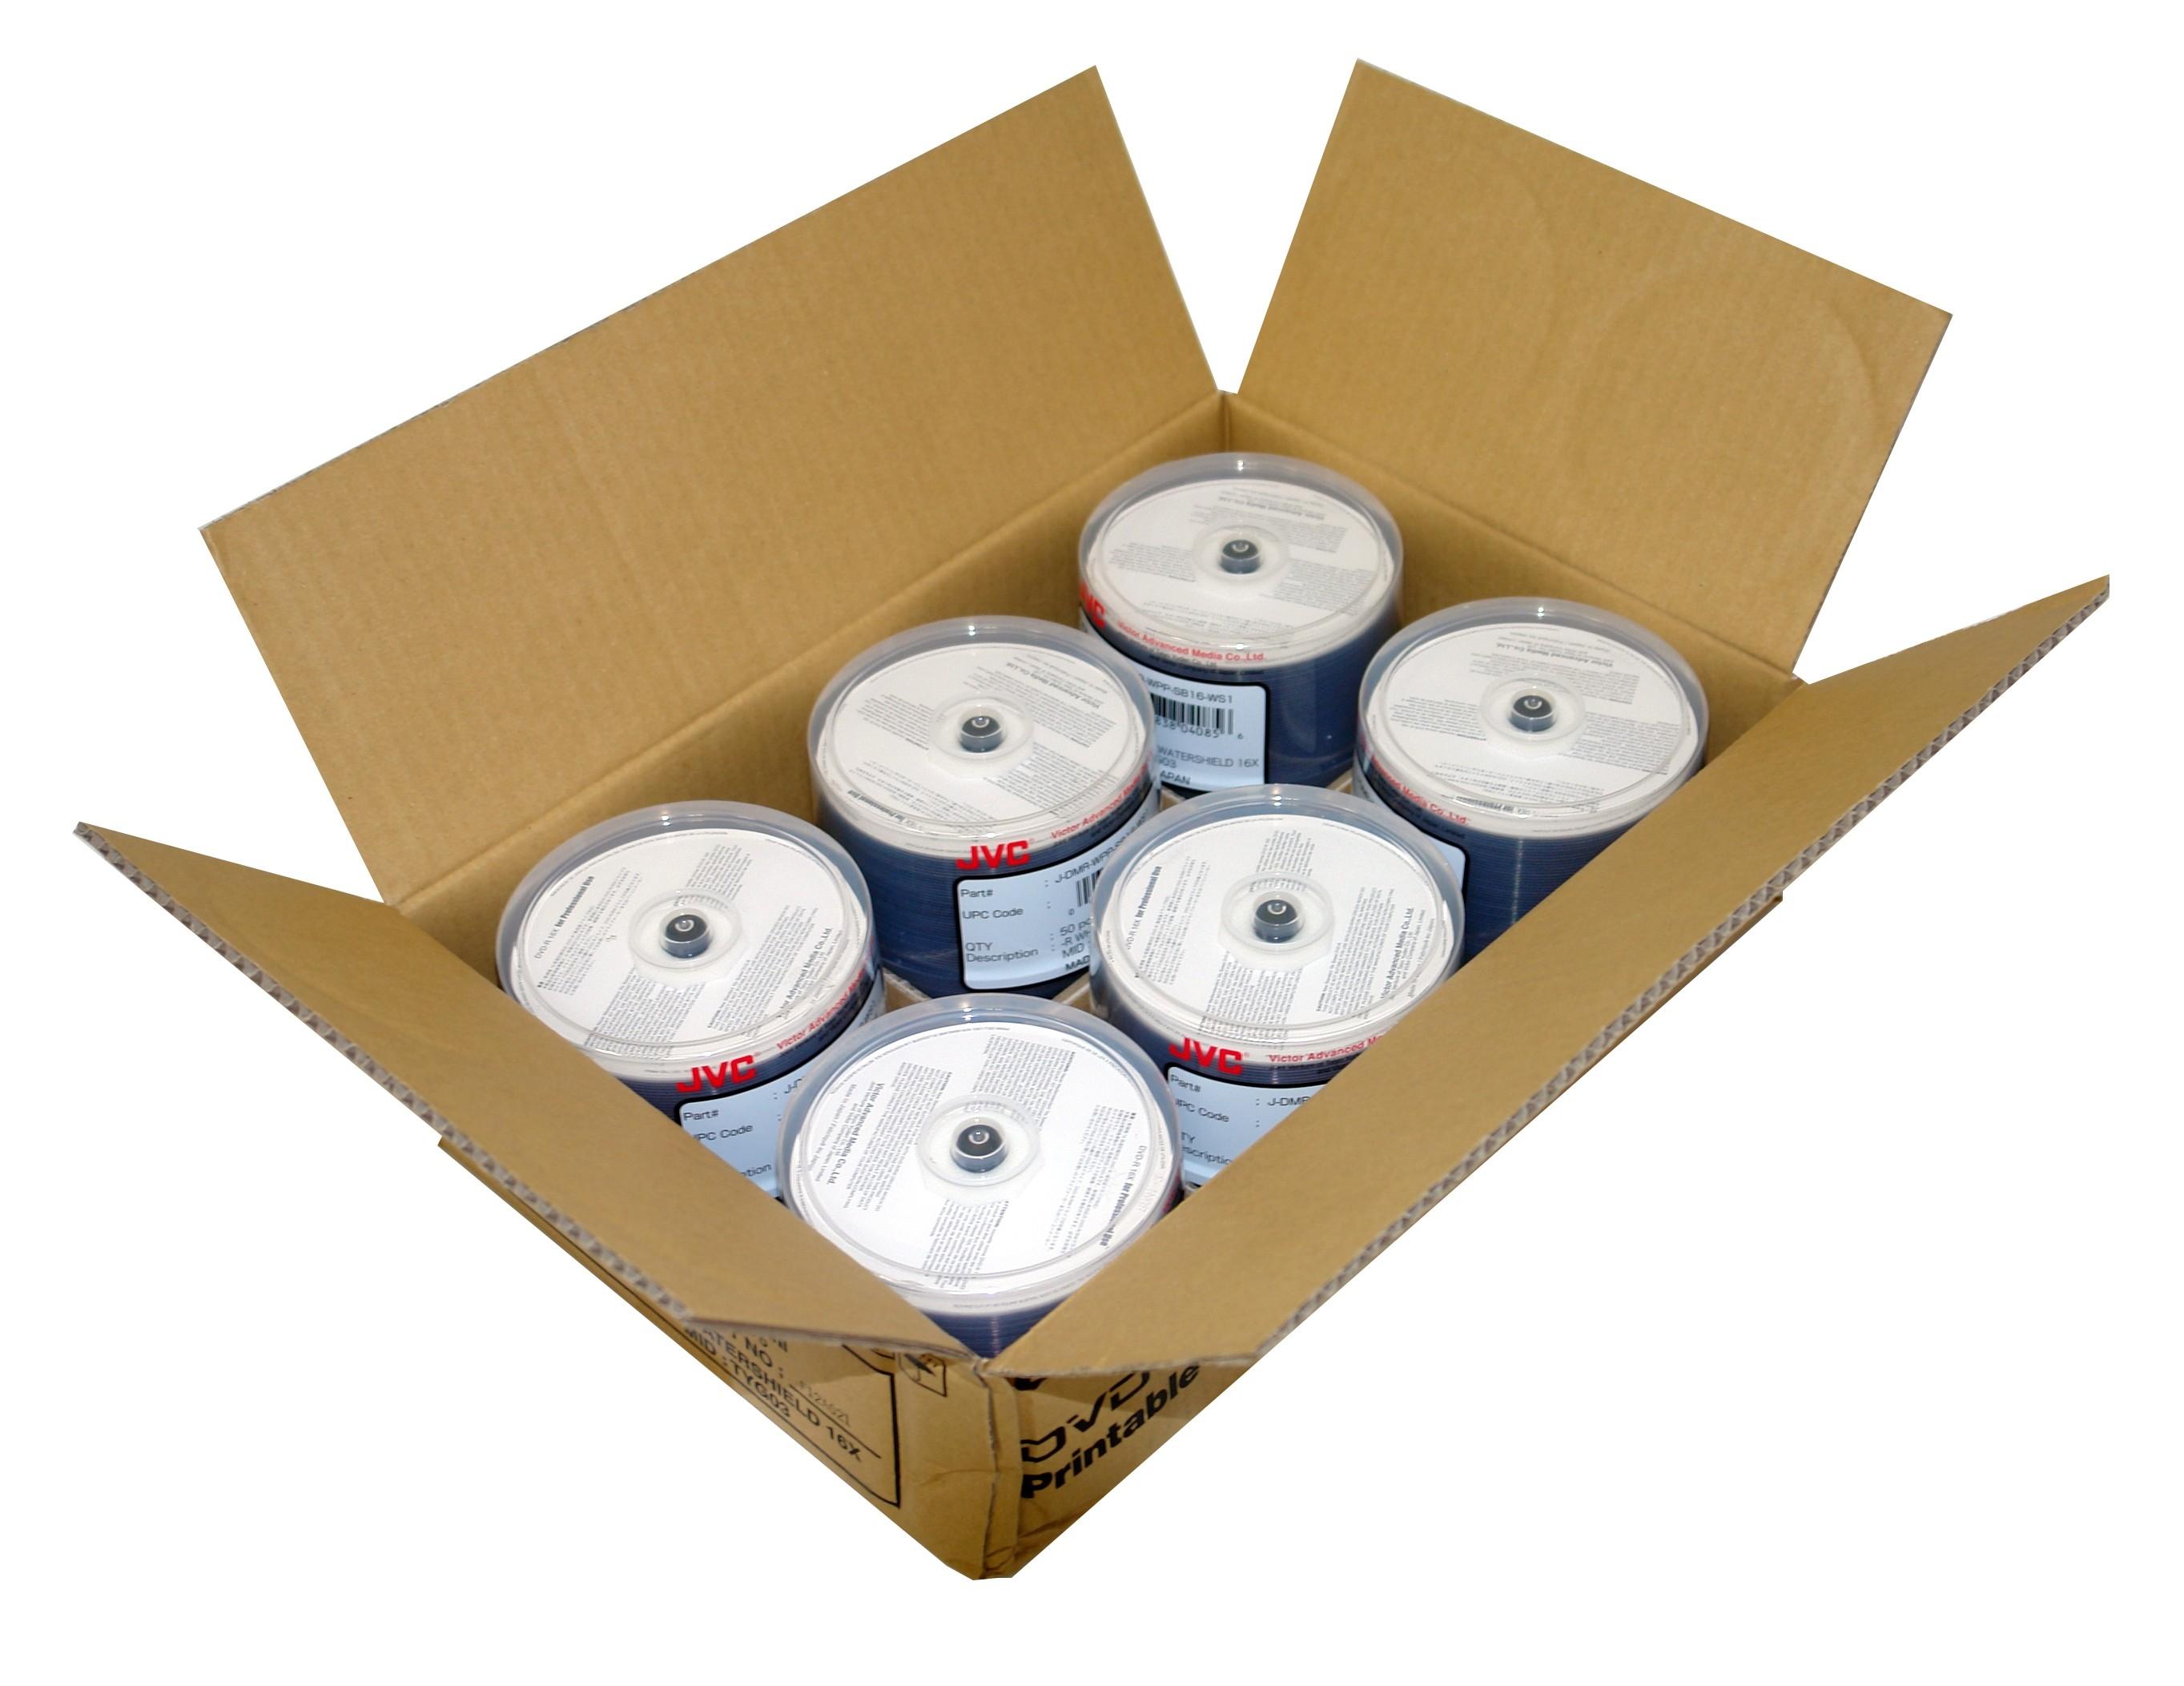 JVC/Taiyo Yuden Watershield DVD-R 16x White - 300 pack